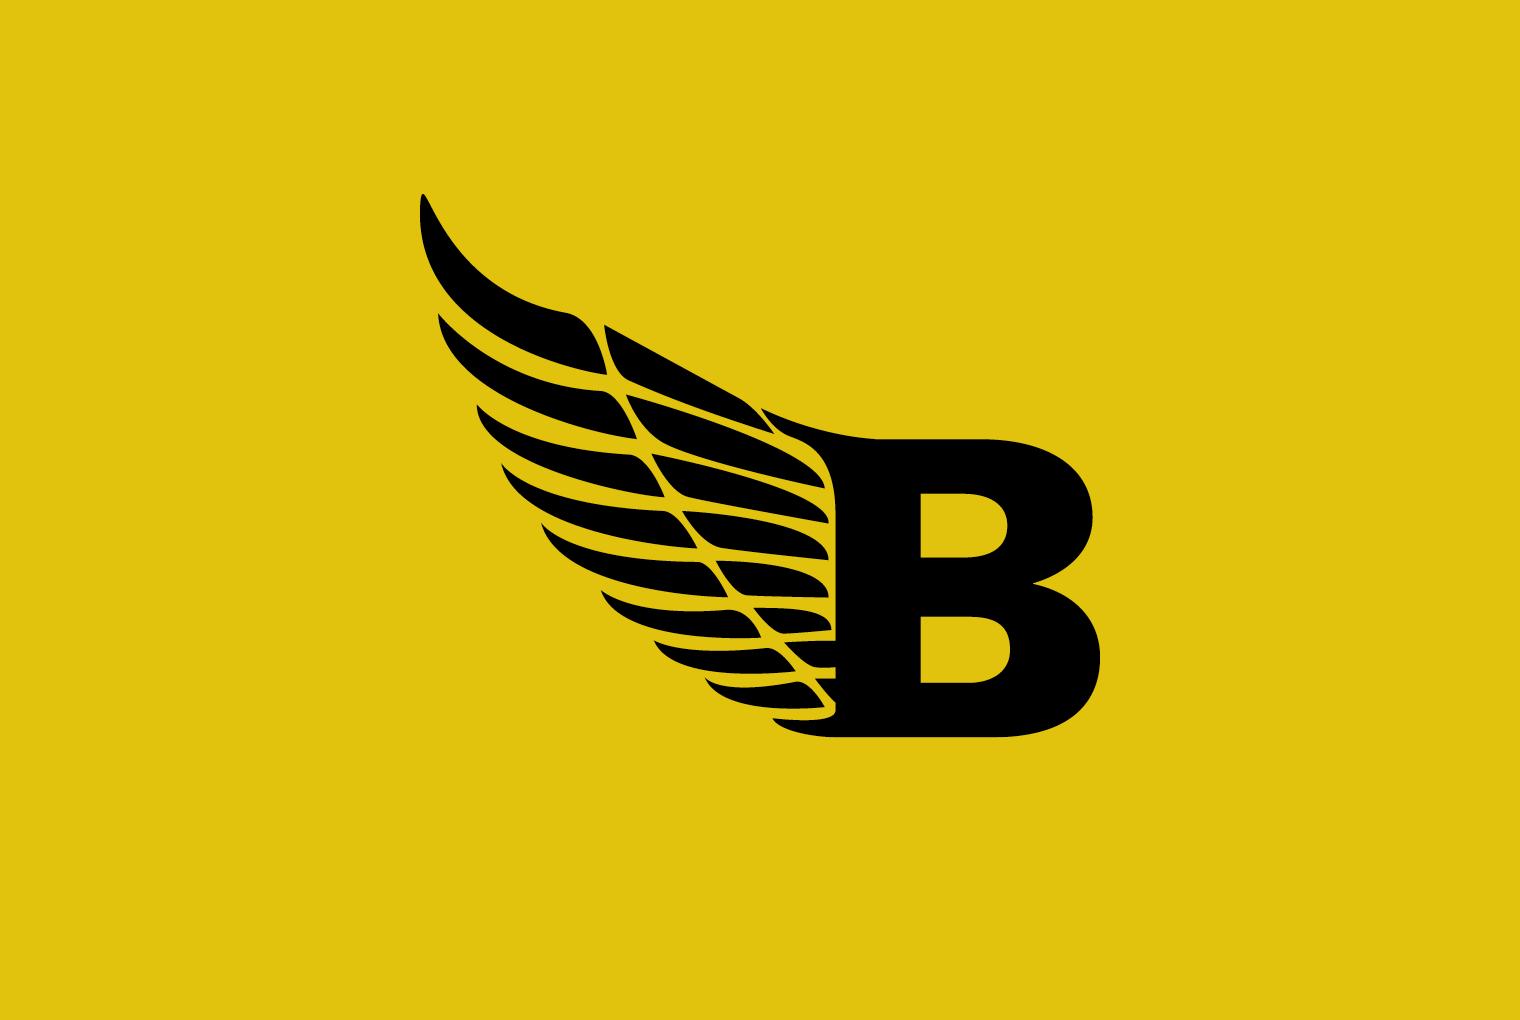 Logos_16_Badnews